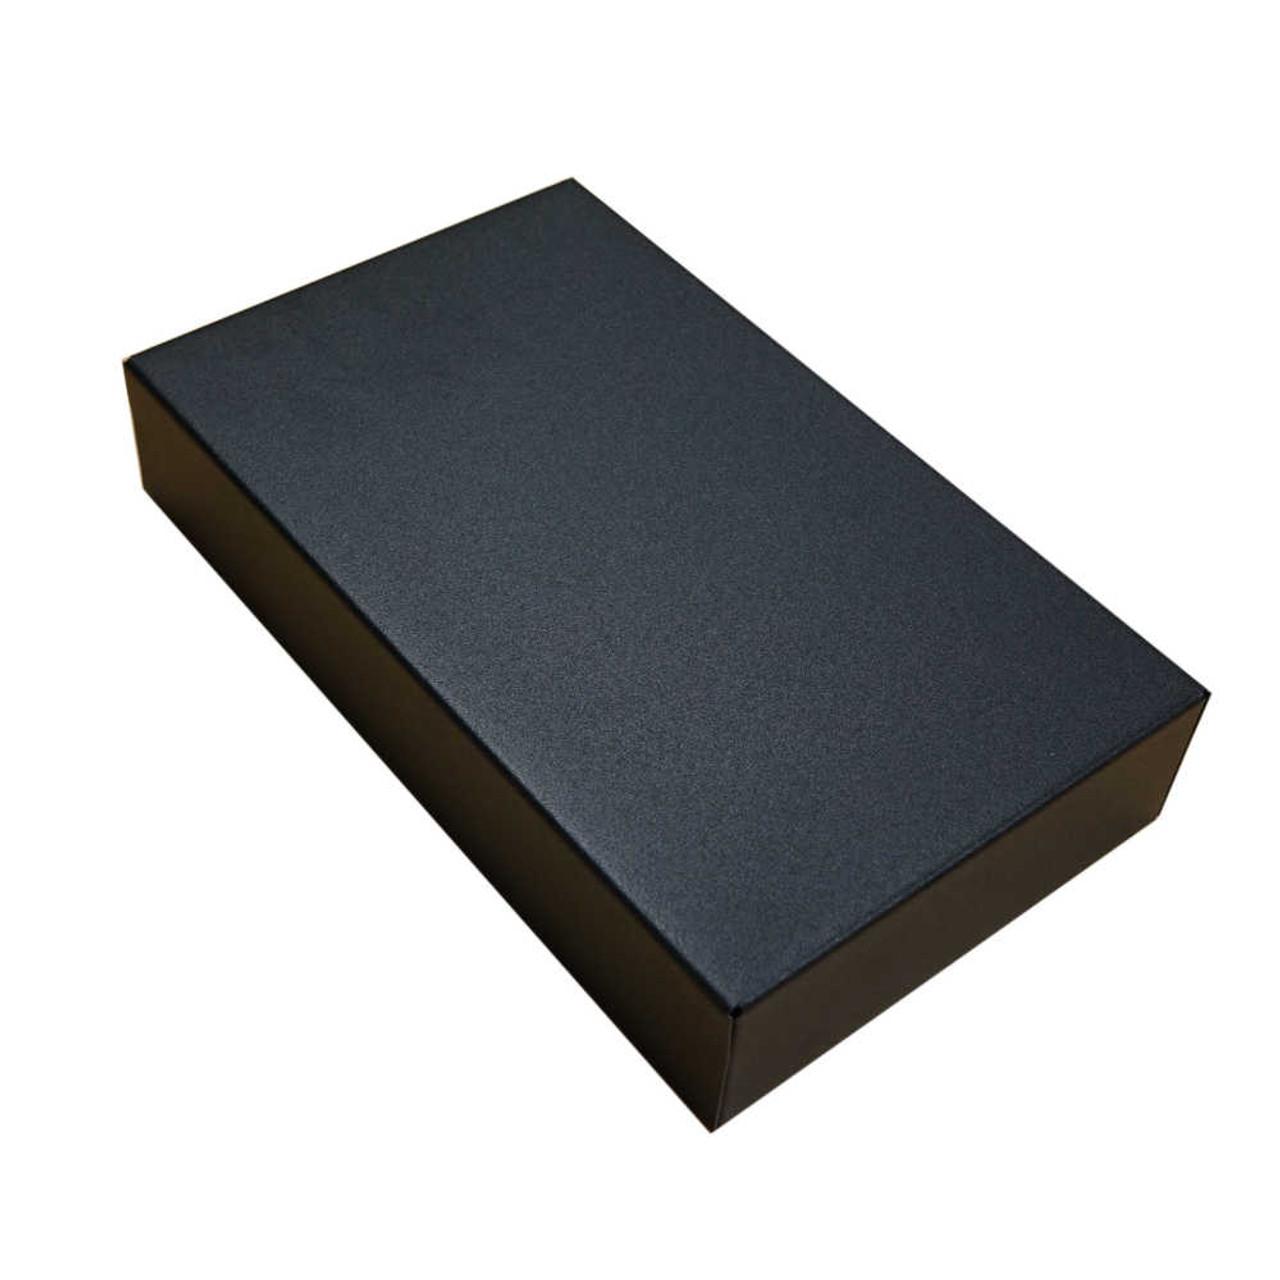 Hammond 1441-16BK3 - Black Steel Chassis 10x6x2